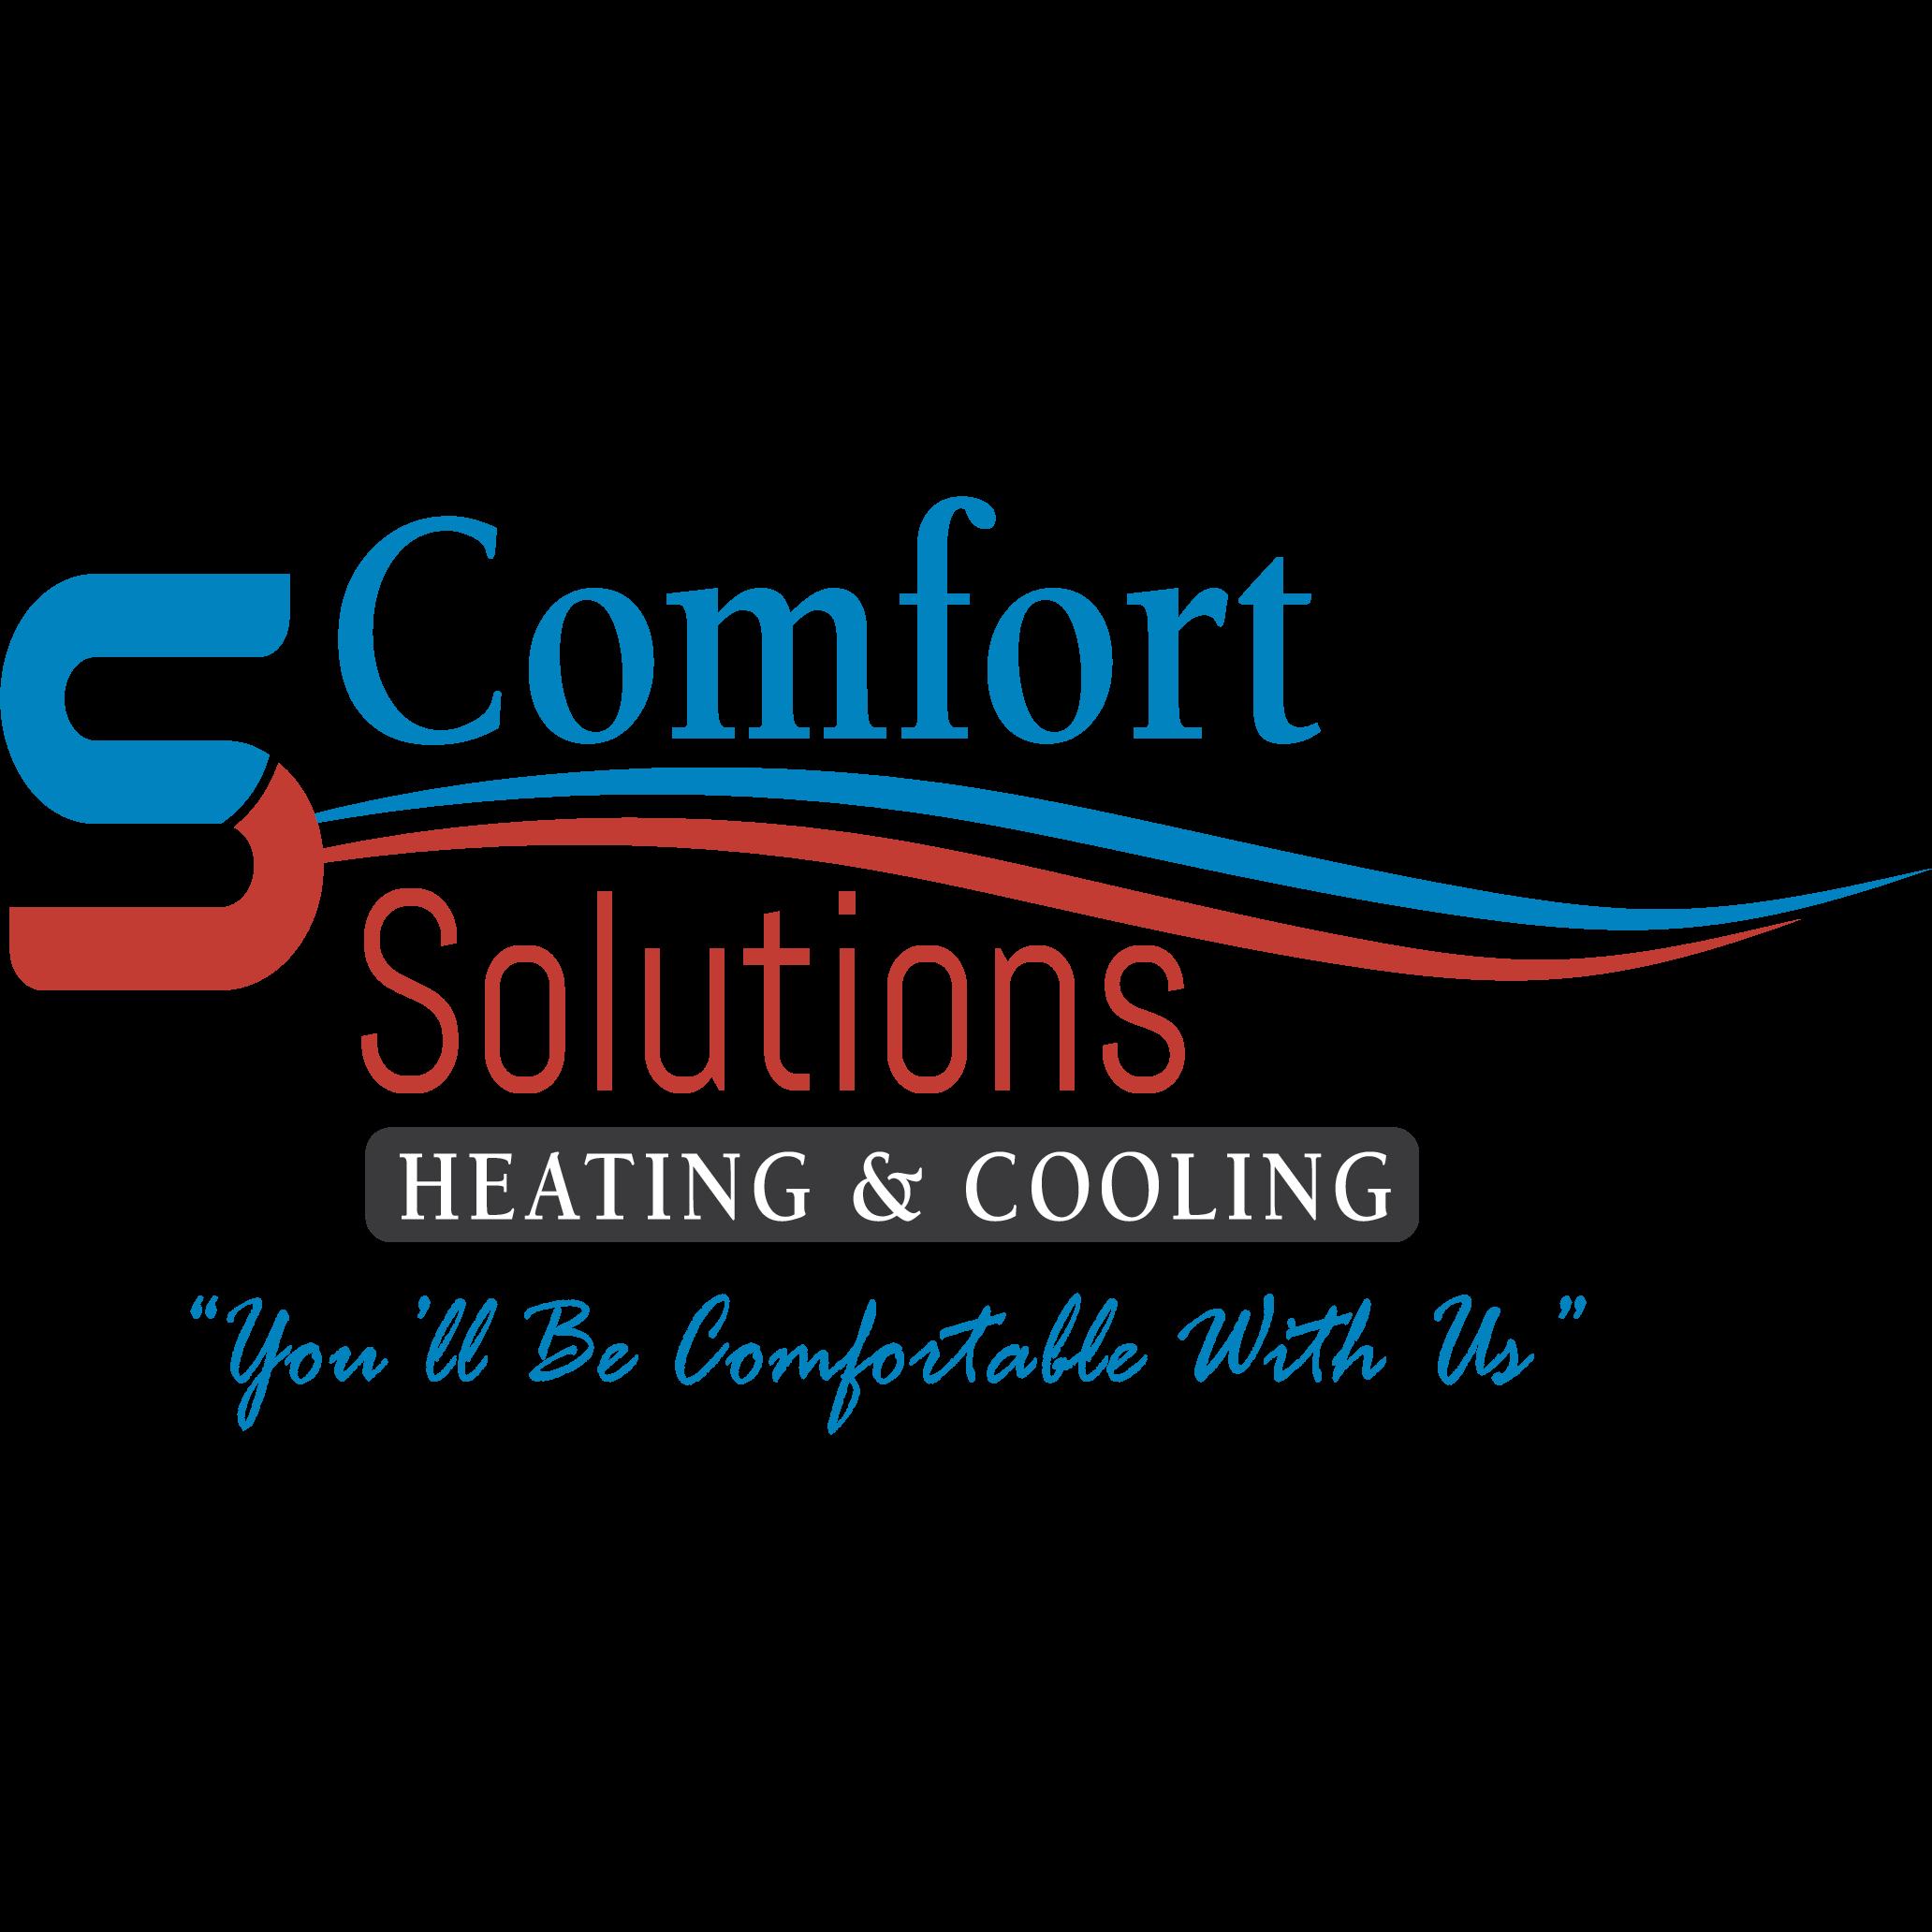 Comfort Solutions Inc.